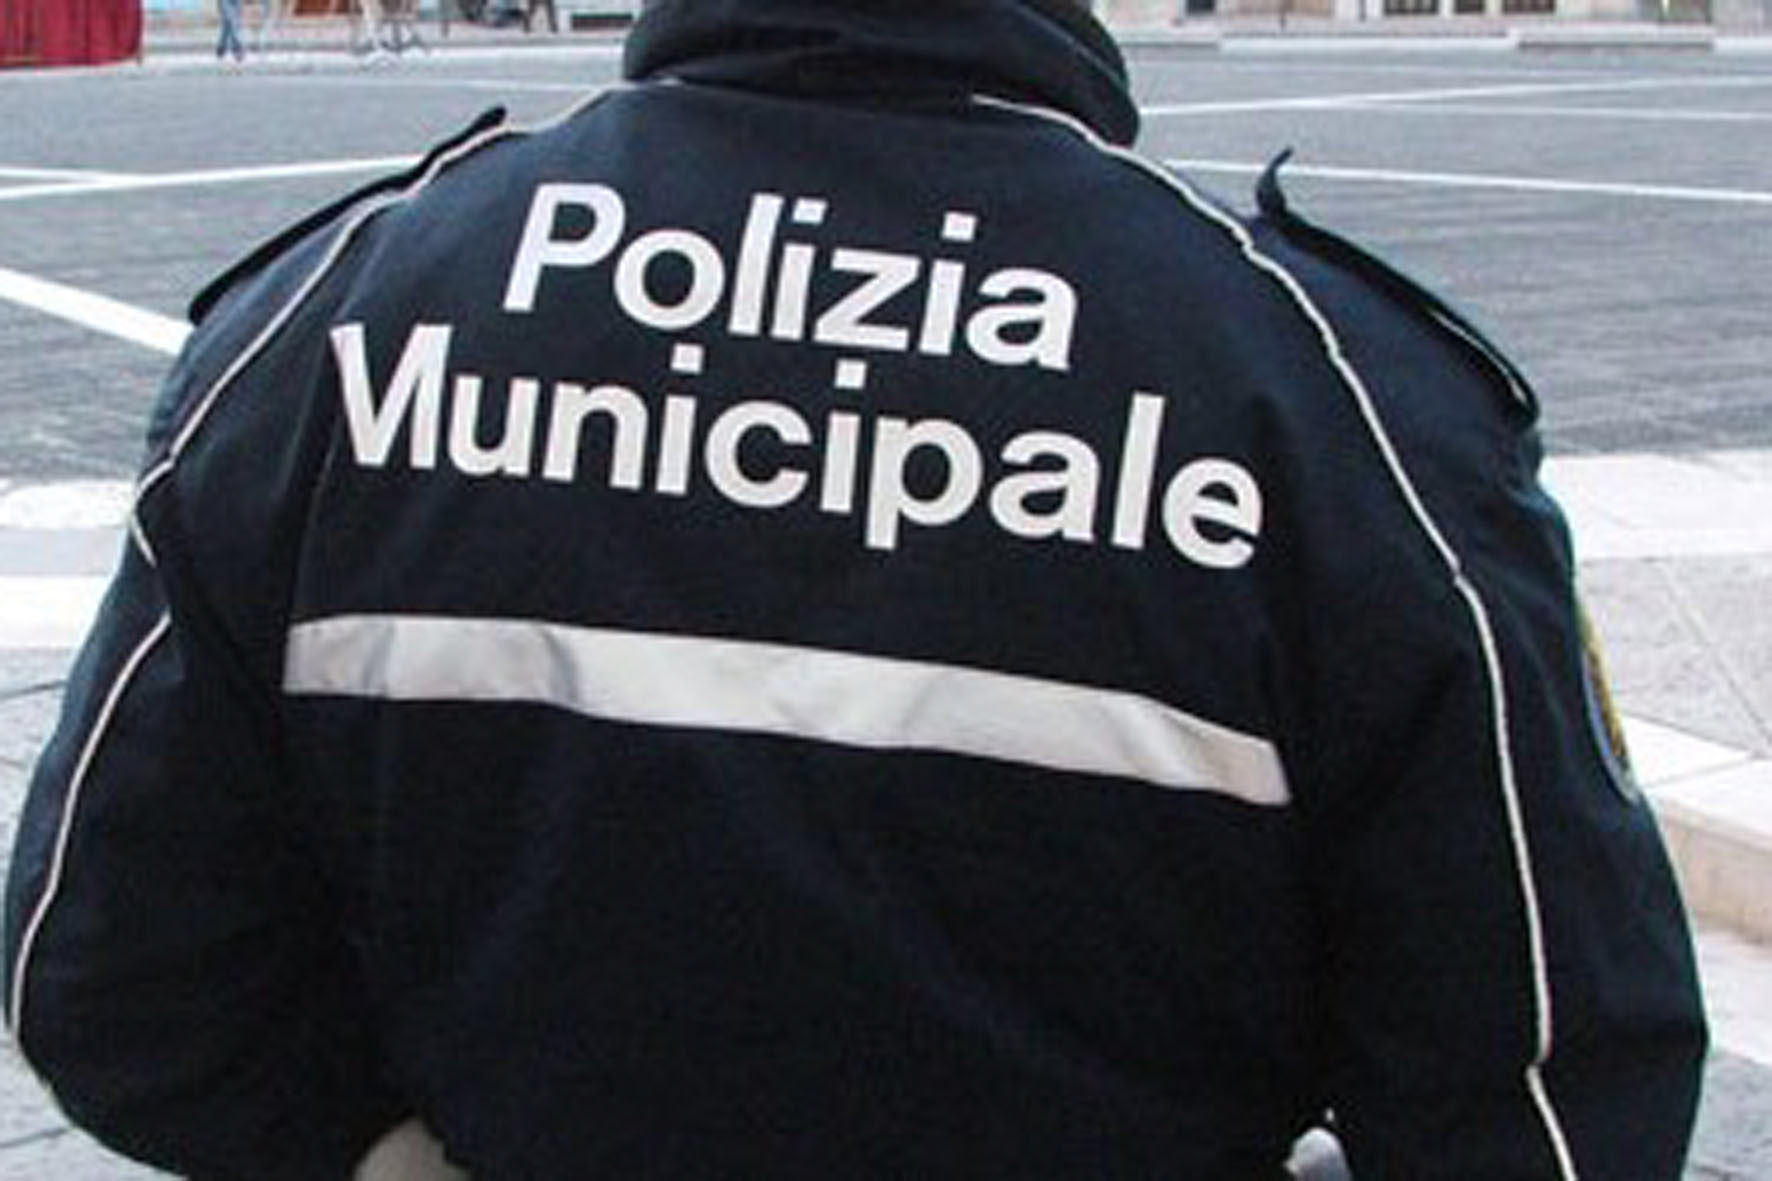 Palermo, vigili indagati: notificata proroga per 84